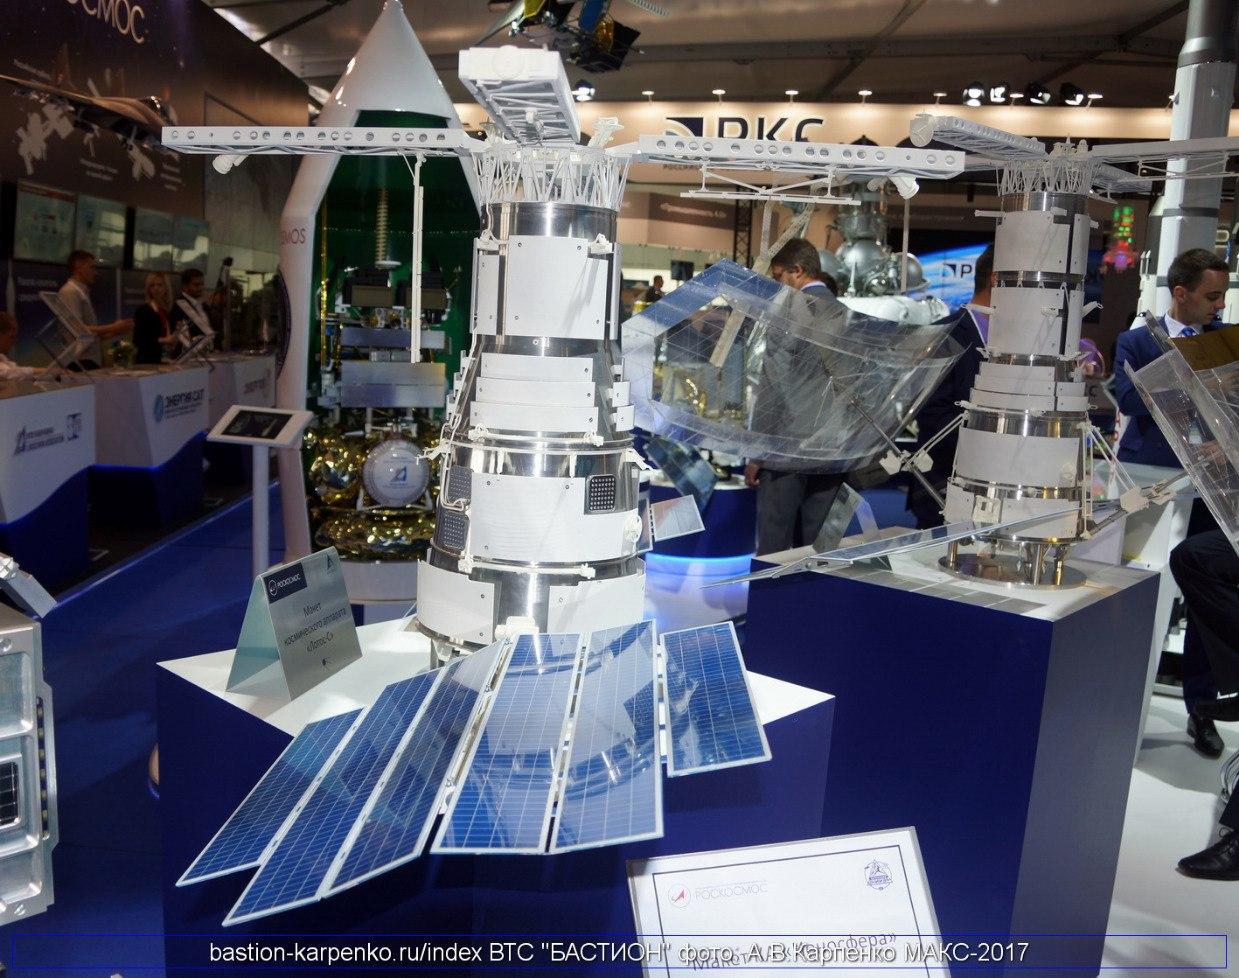 Russian Military Satellites: News & Development - Page 6 Jlmi71tdkes